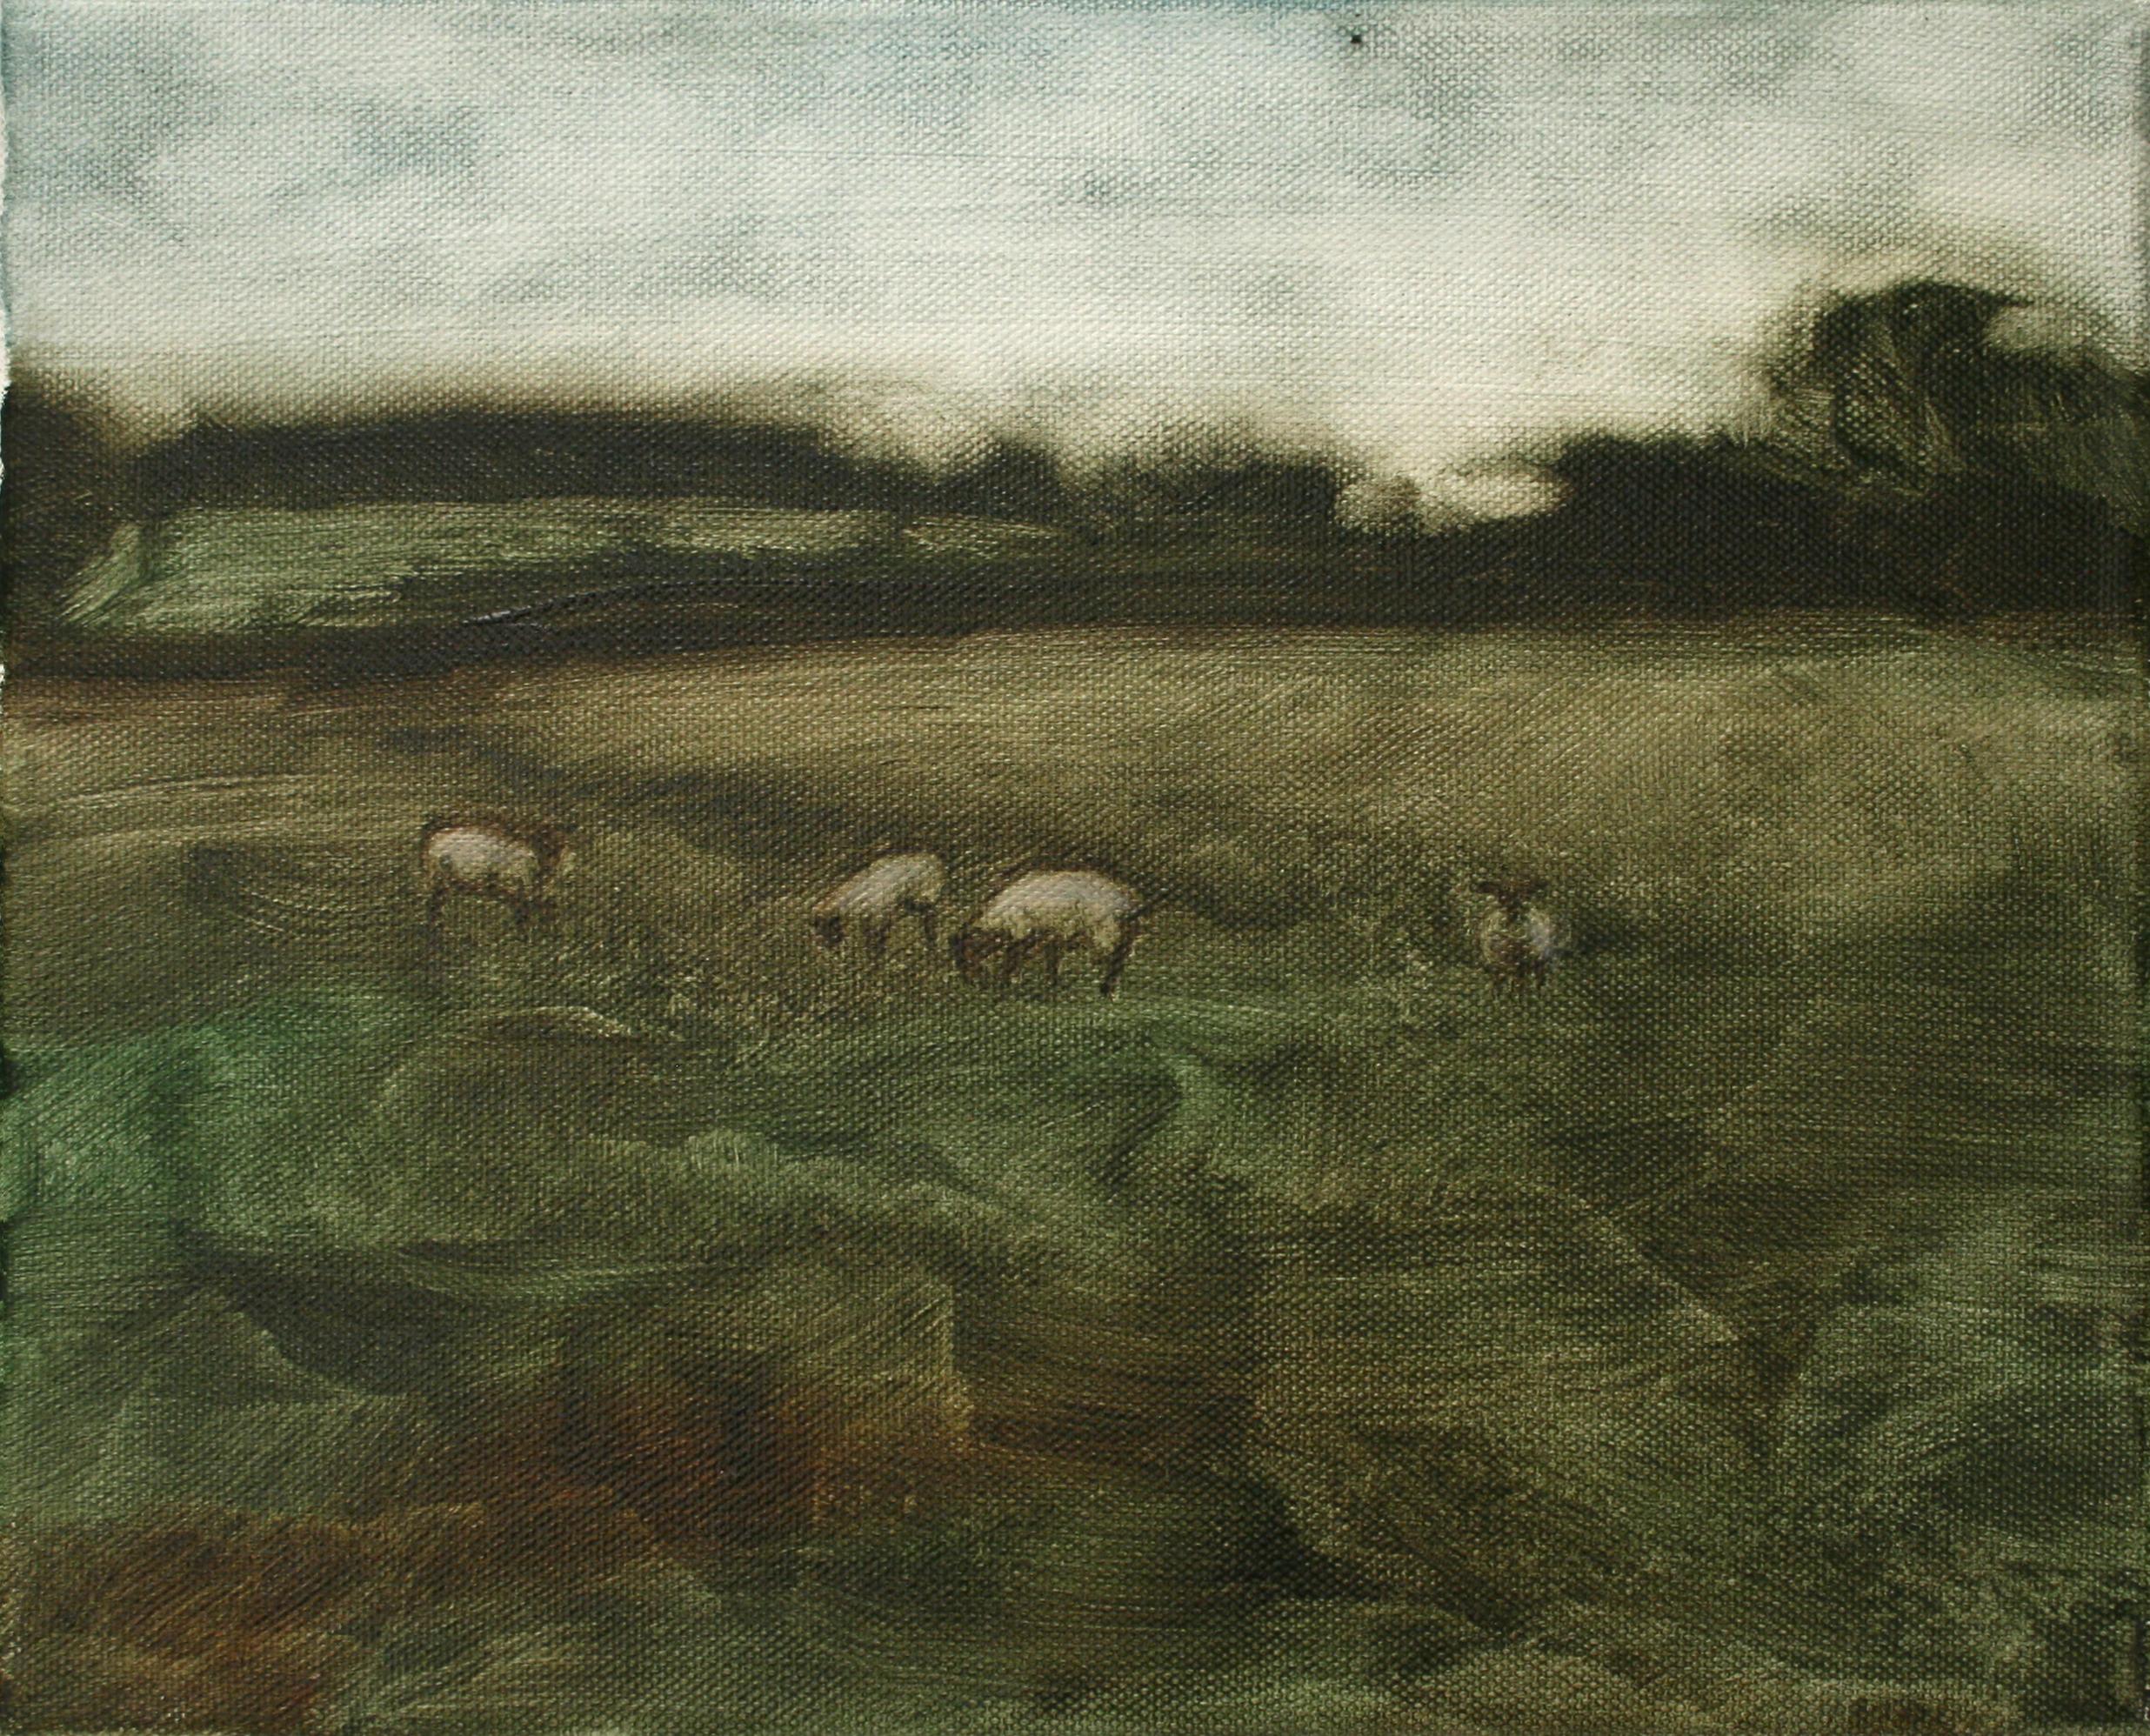 "Sheep Study 3, oil on canvas 30 x 24.5 cm (12"" x 9.5""), 2016"